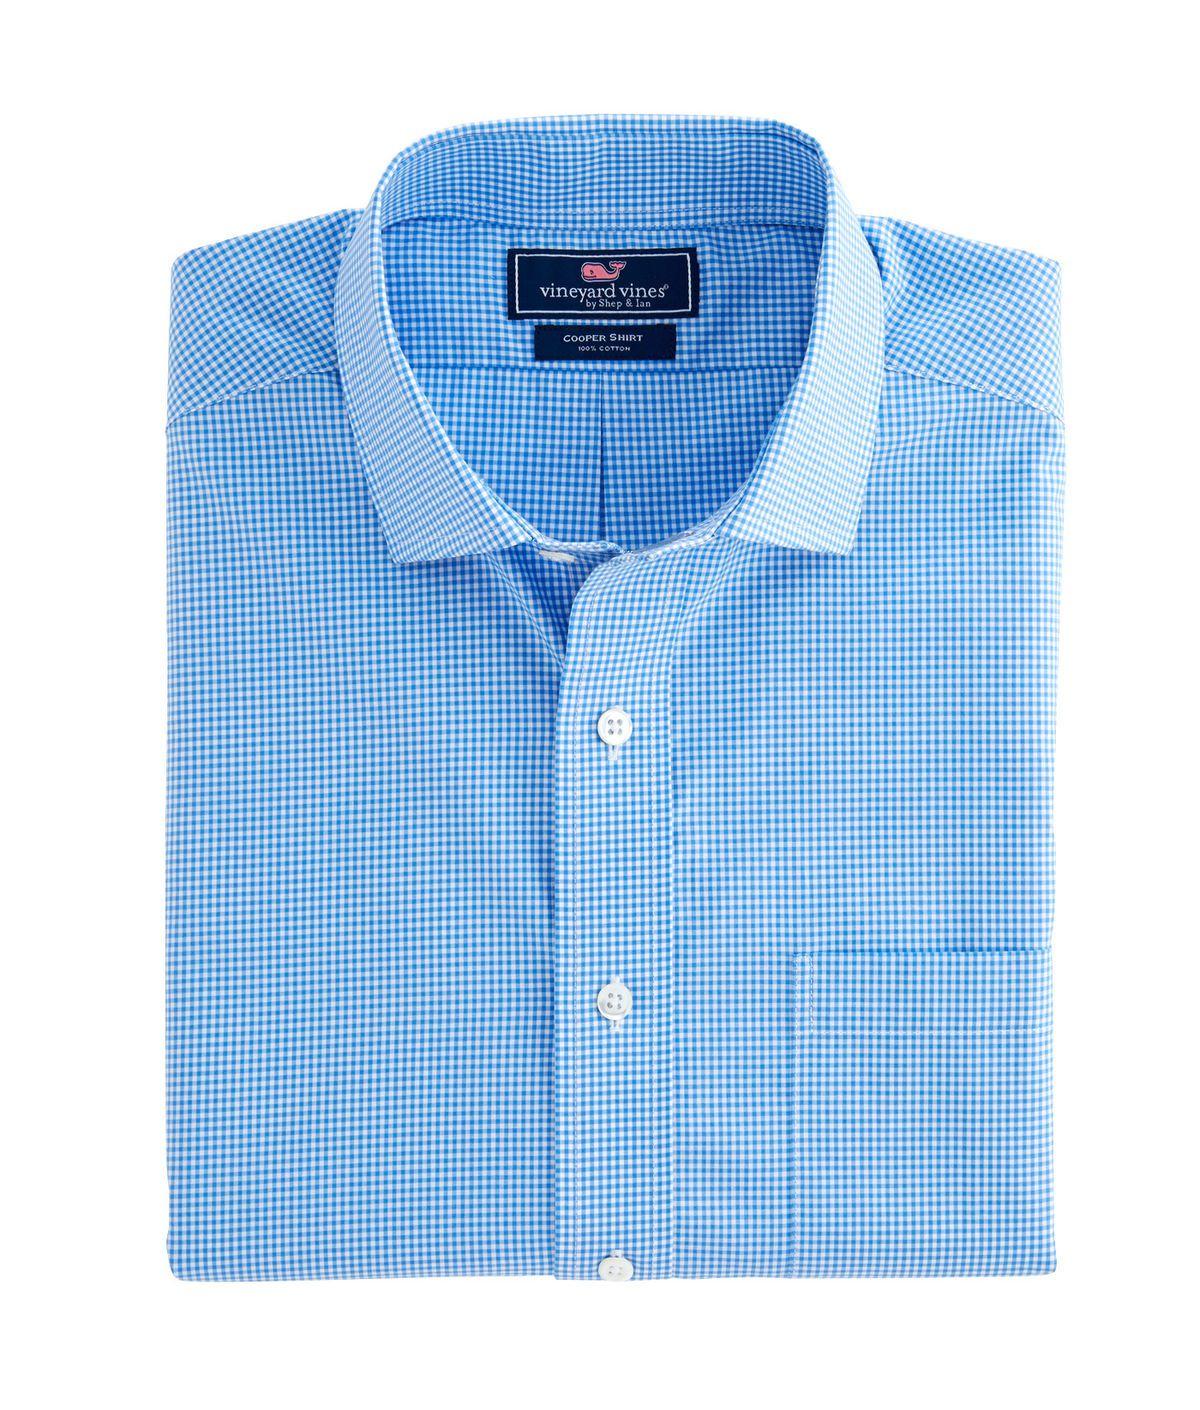 Cove Pong Gingham Classic Cooper Shirt